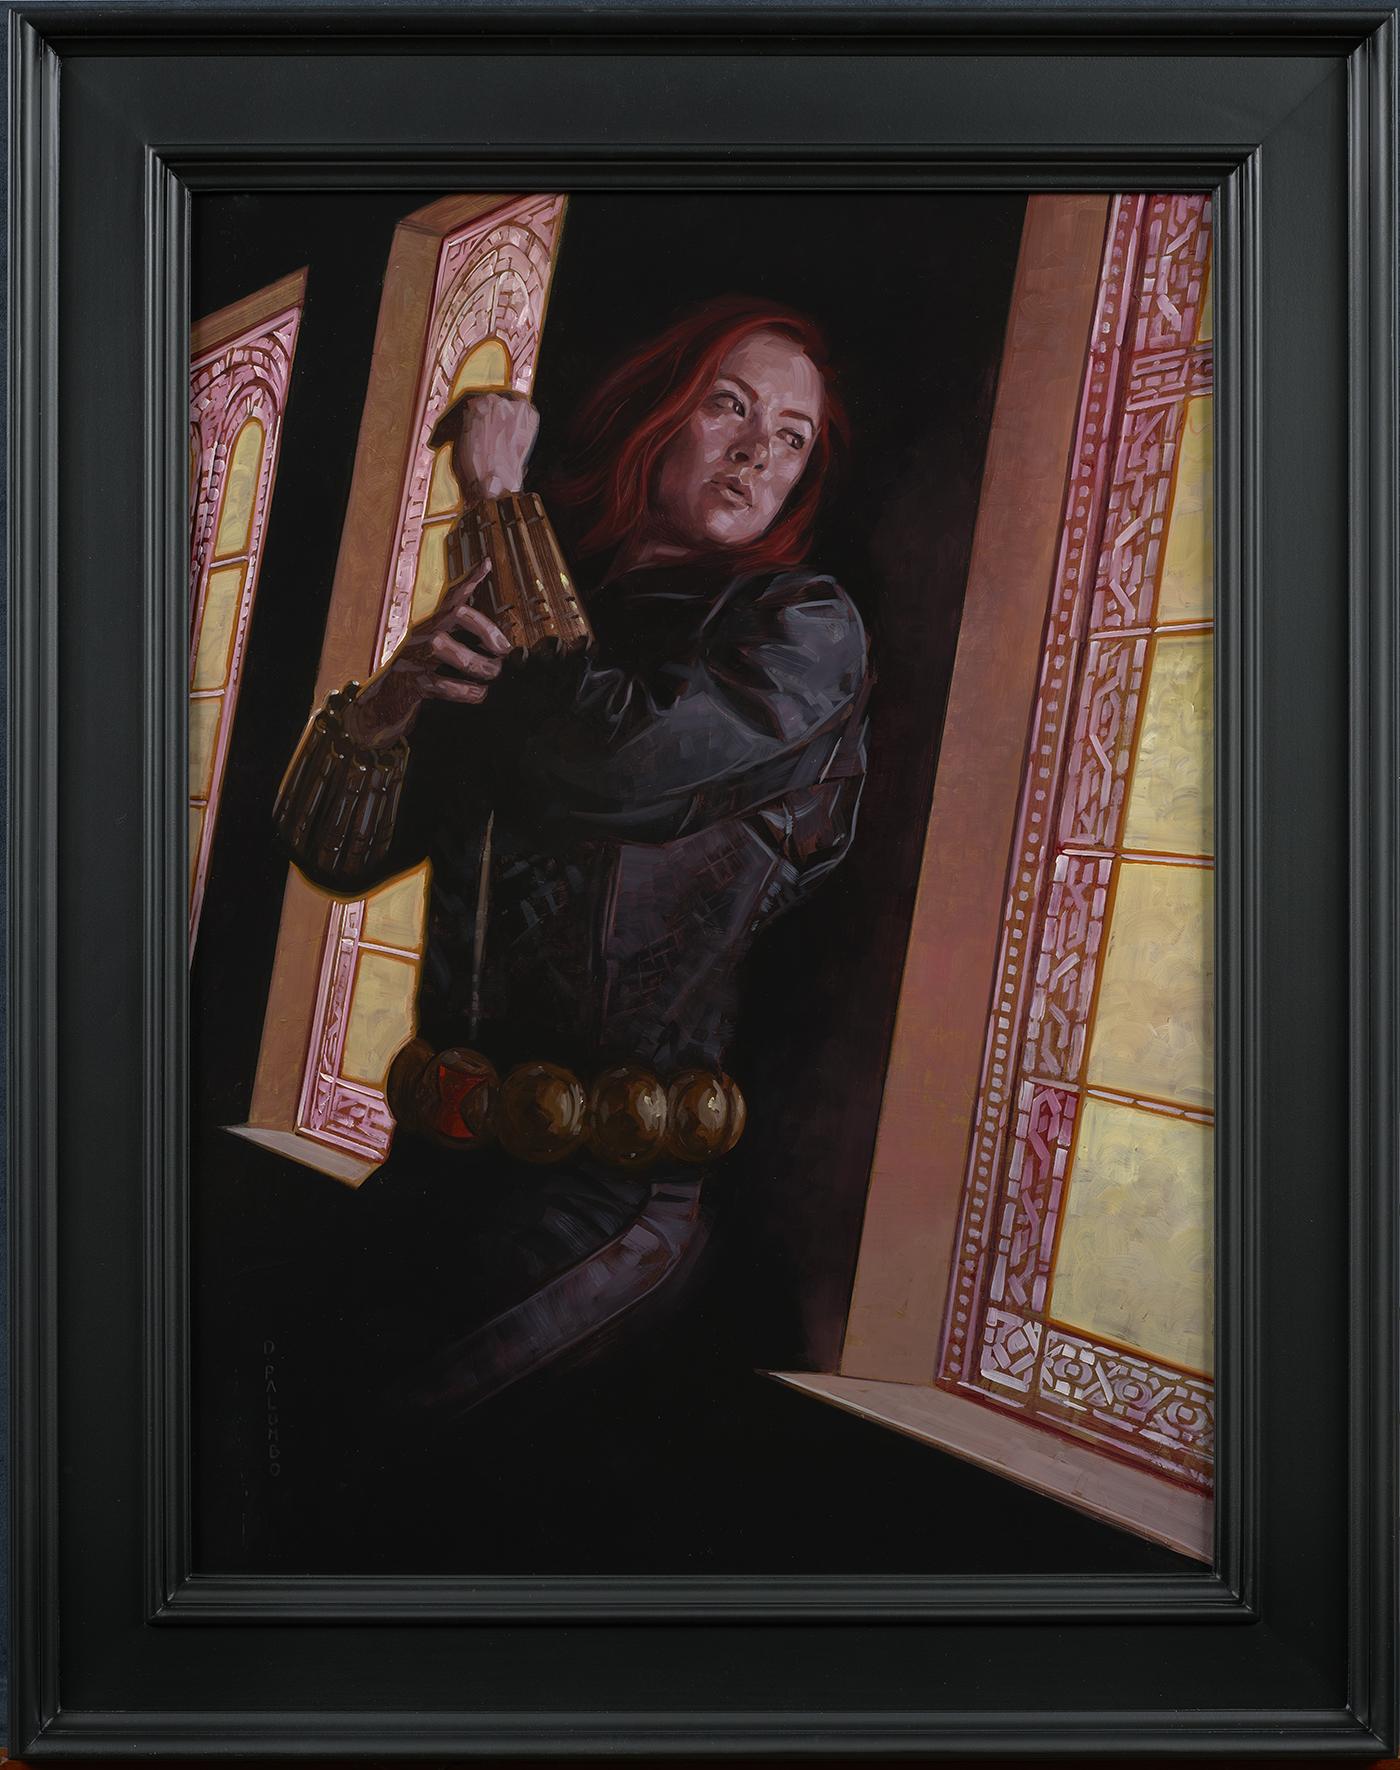 david_palumbo_dp1153_black_widow_framed.jpg